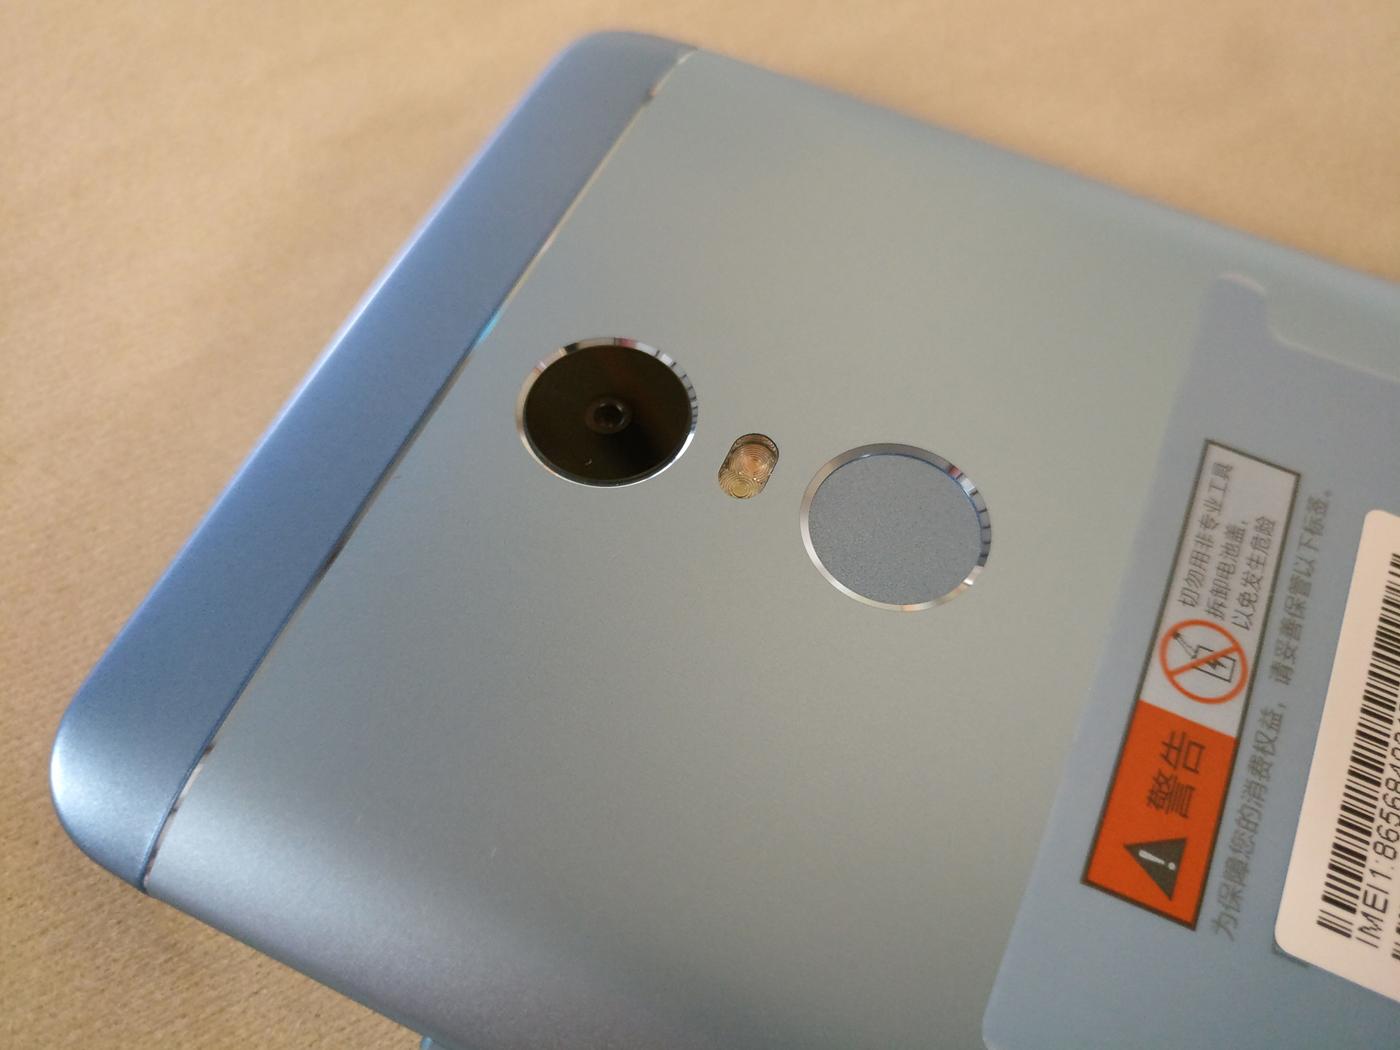 Harga Jual Xiaomi Redmi Note 4x Ram 3gb Chinamobilemag 25k 16gb Blackgoldgreyrose Goldblue About Original Size 55inch Cpuqualcomm Msm8953 Snapdragon 625octa Core 20 Ghz